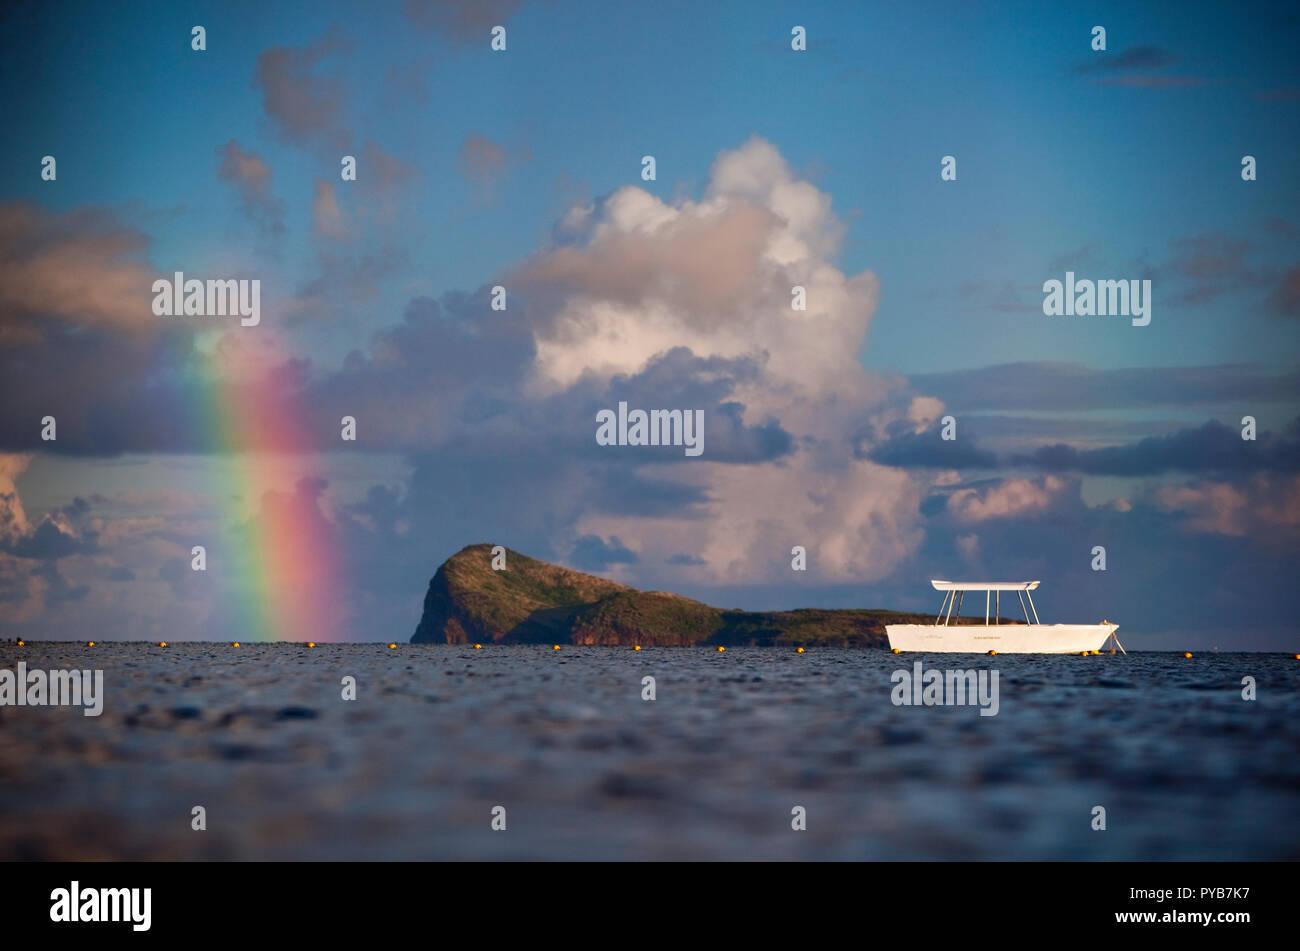 Rainbow over Flat Island, Mauritius. - Stock Image